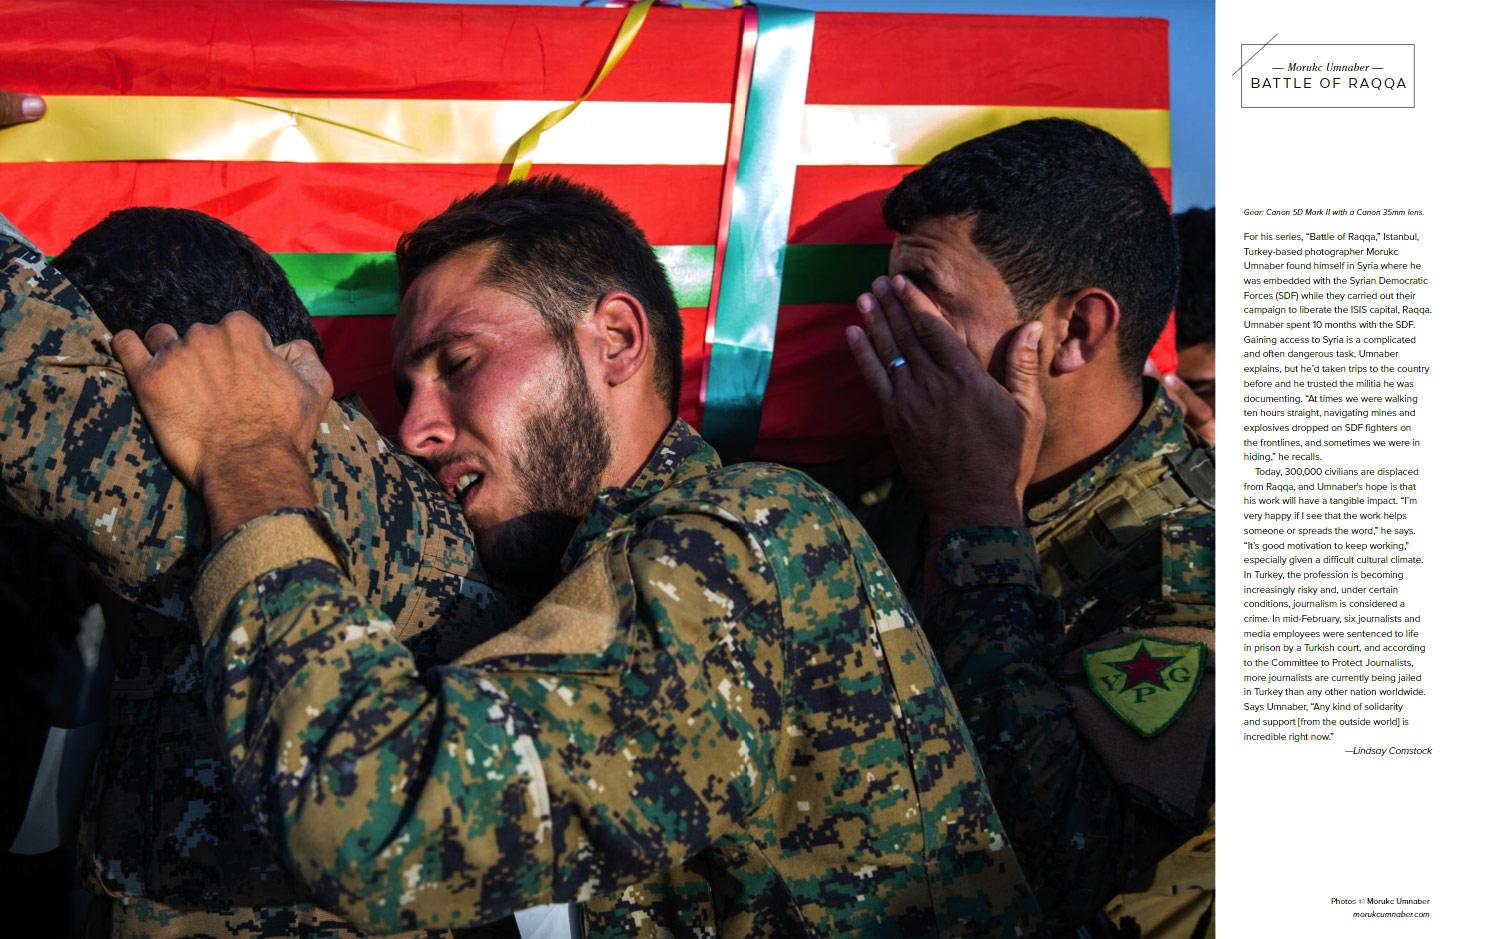 Battle Of Raqqa, © Morukc Umnaber, Emerging Photographer